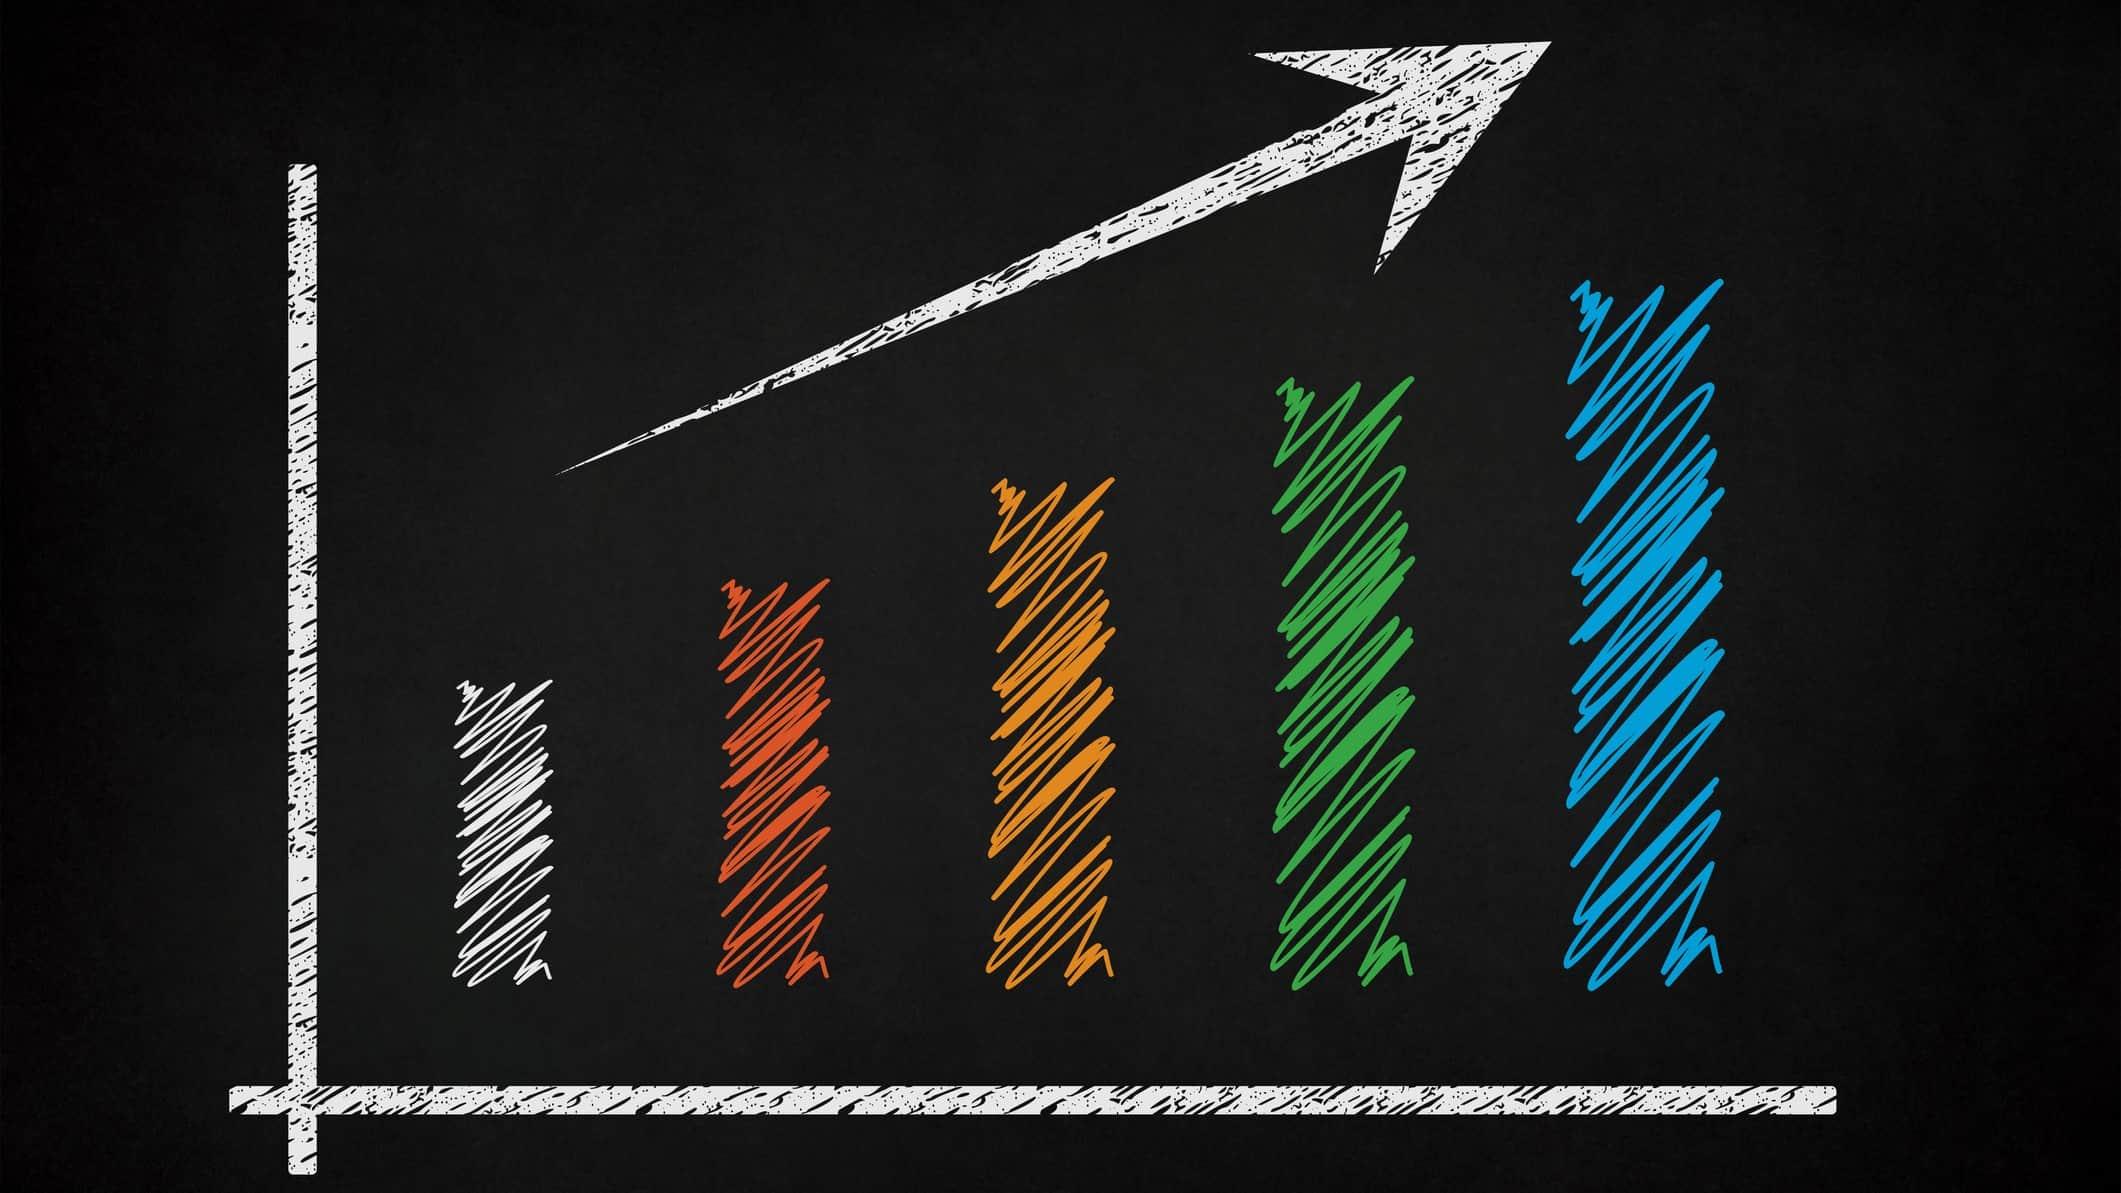 colourful chalk drawing on blackboard of increasing asx share price bar graph